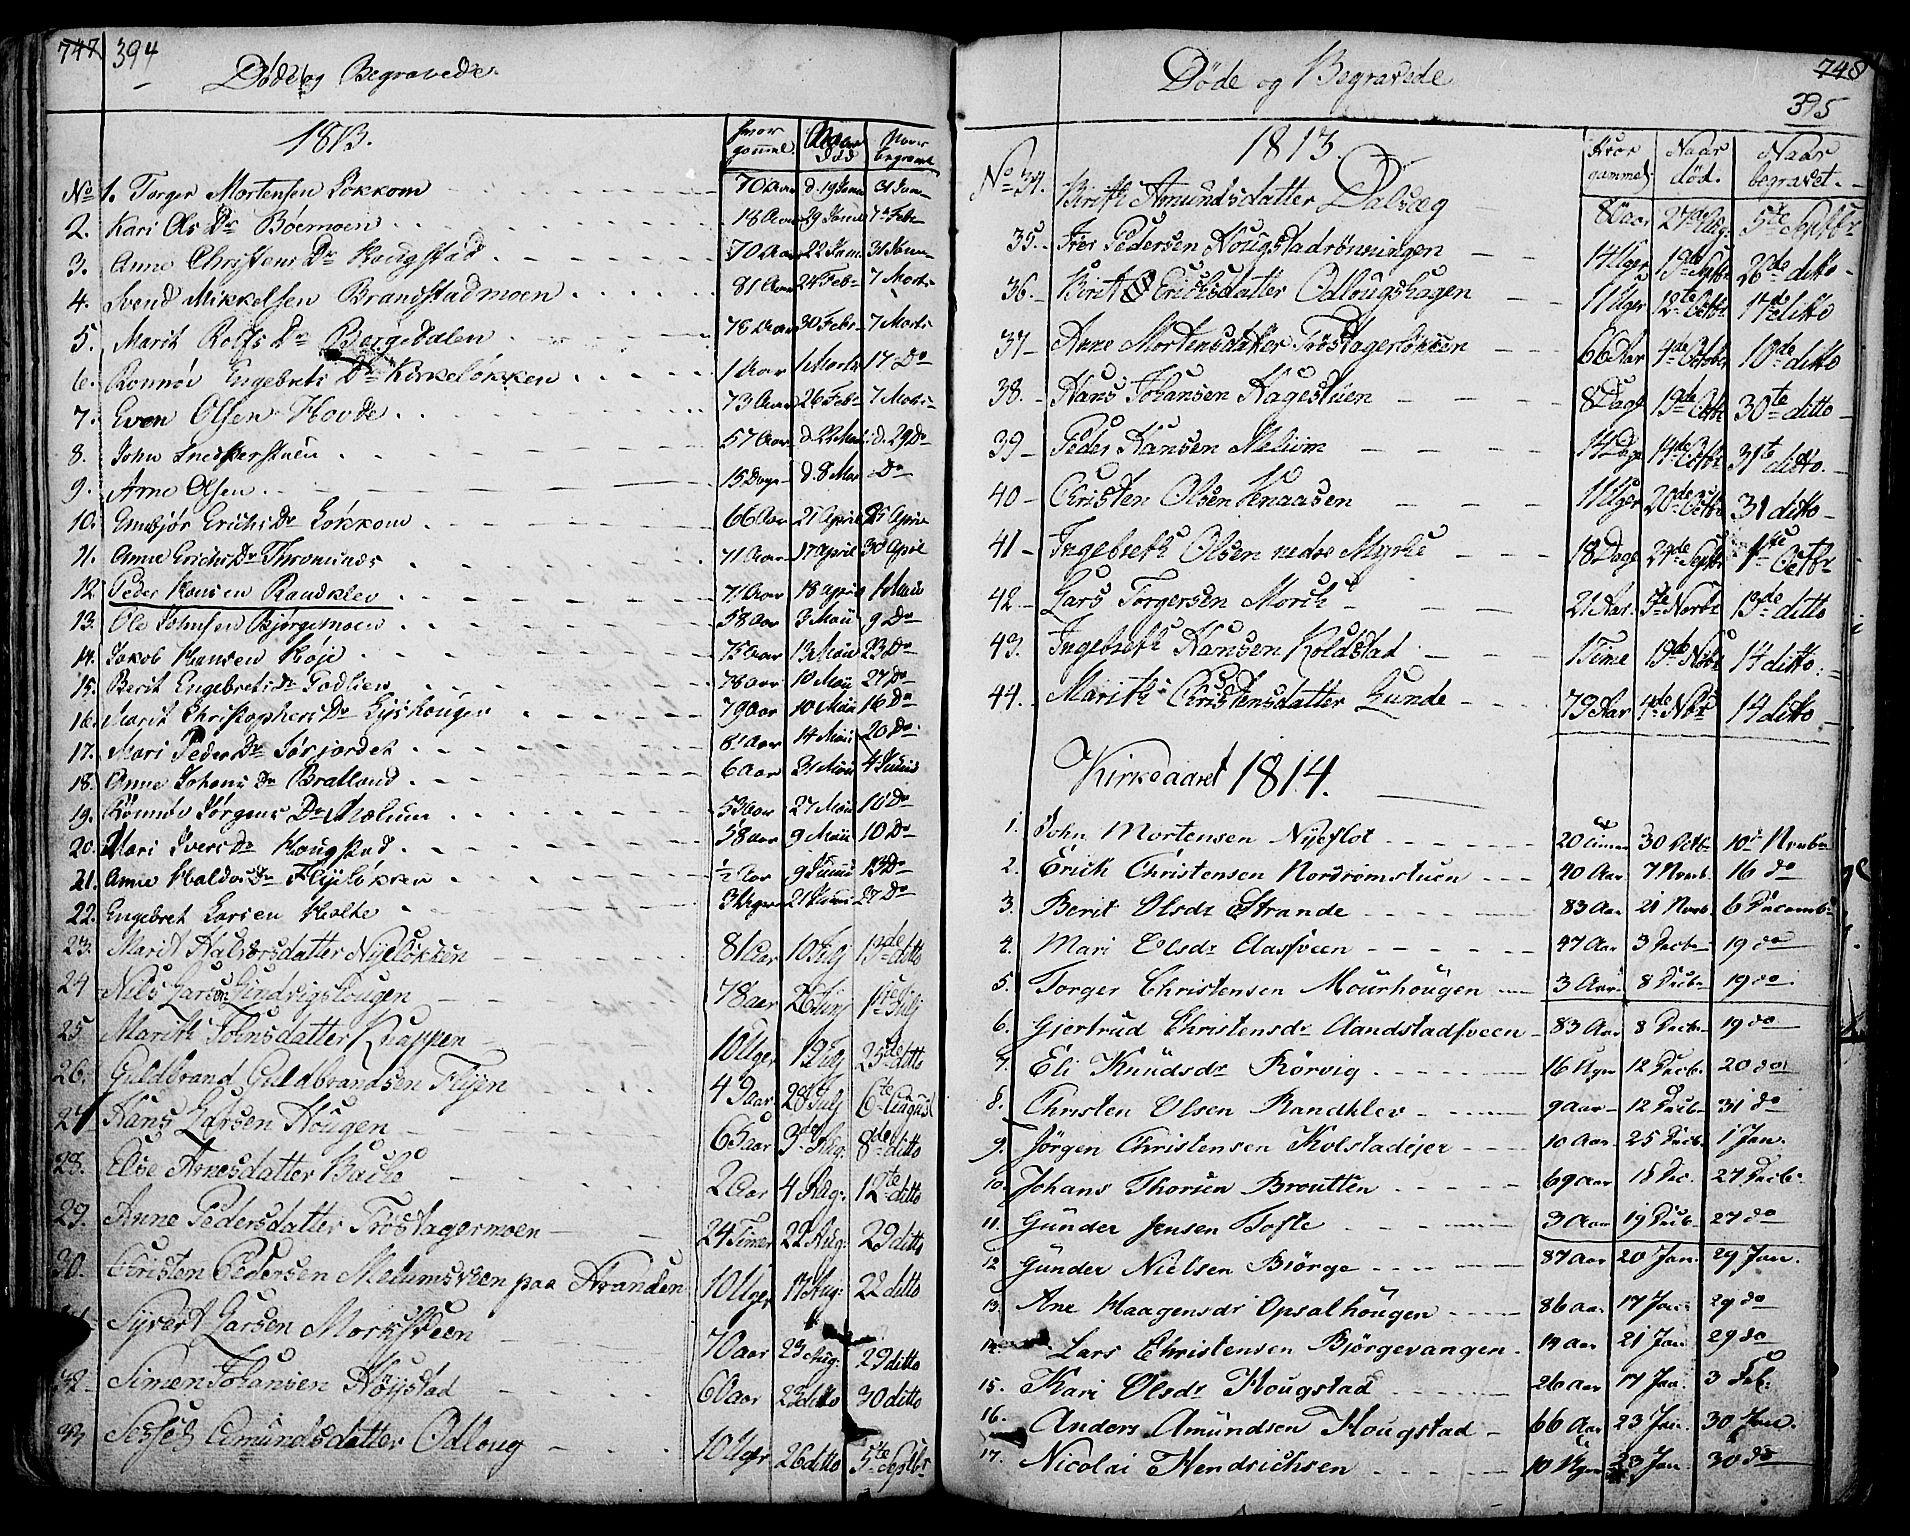 SAH, Ringebu prestekontor, Ministerialbok nr. 3, 1781-1820, s. 394-395